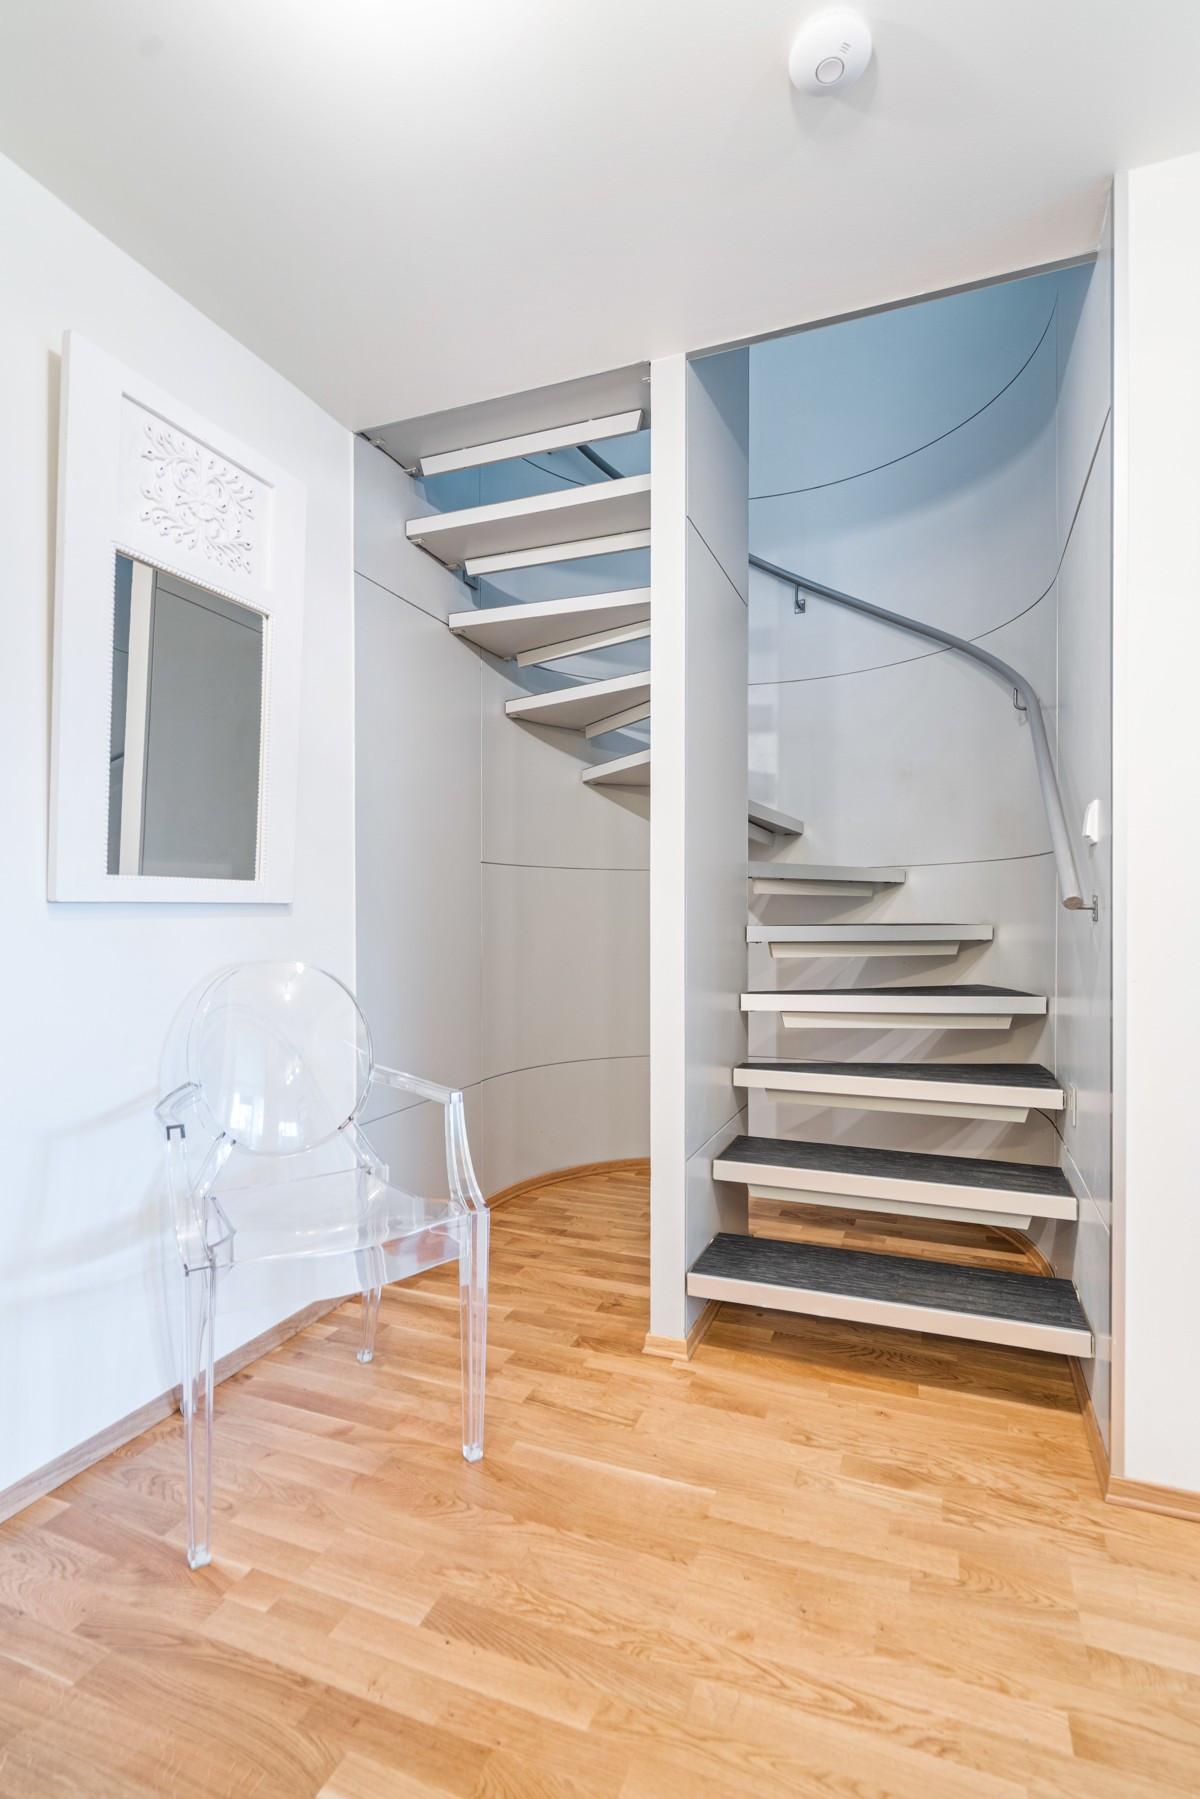 Stilig trapperom mellom etasjene